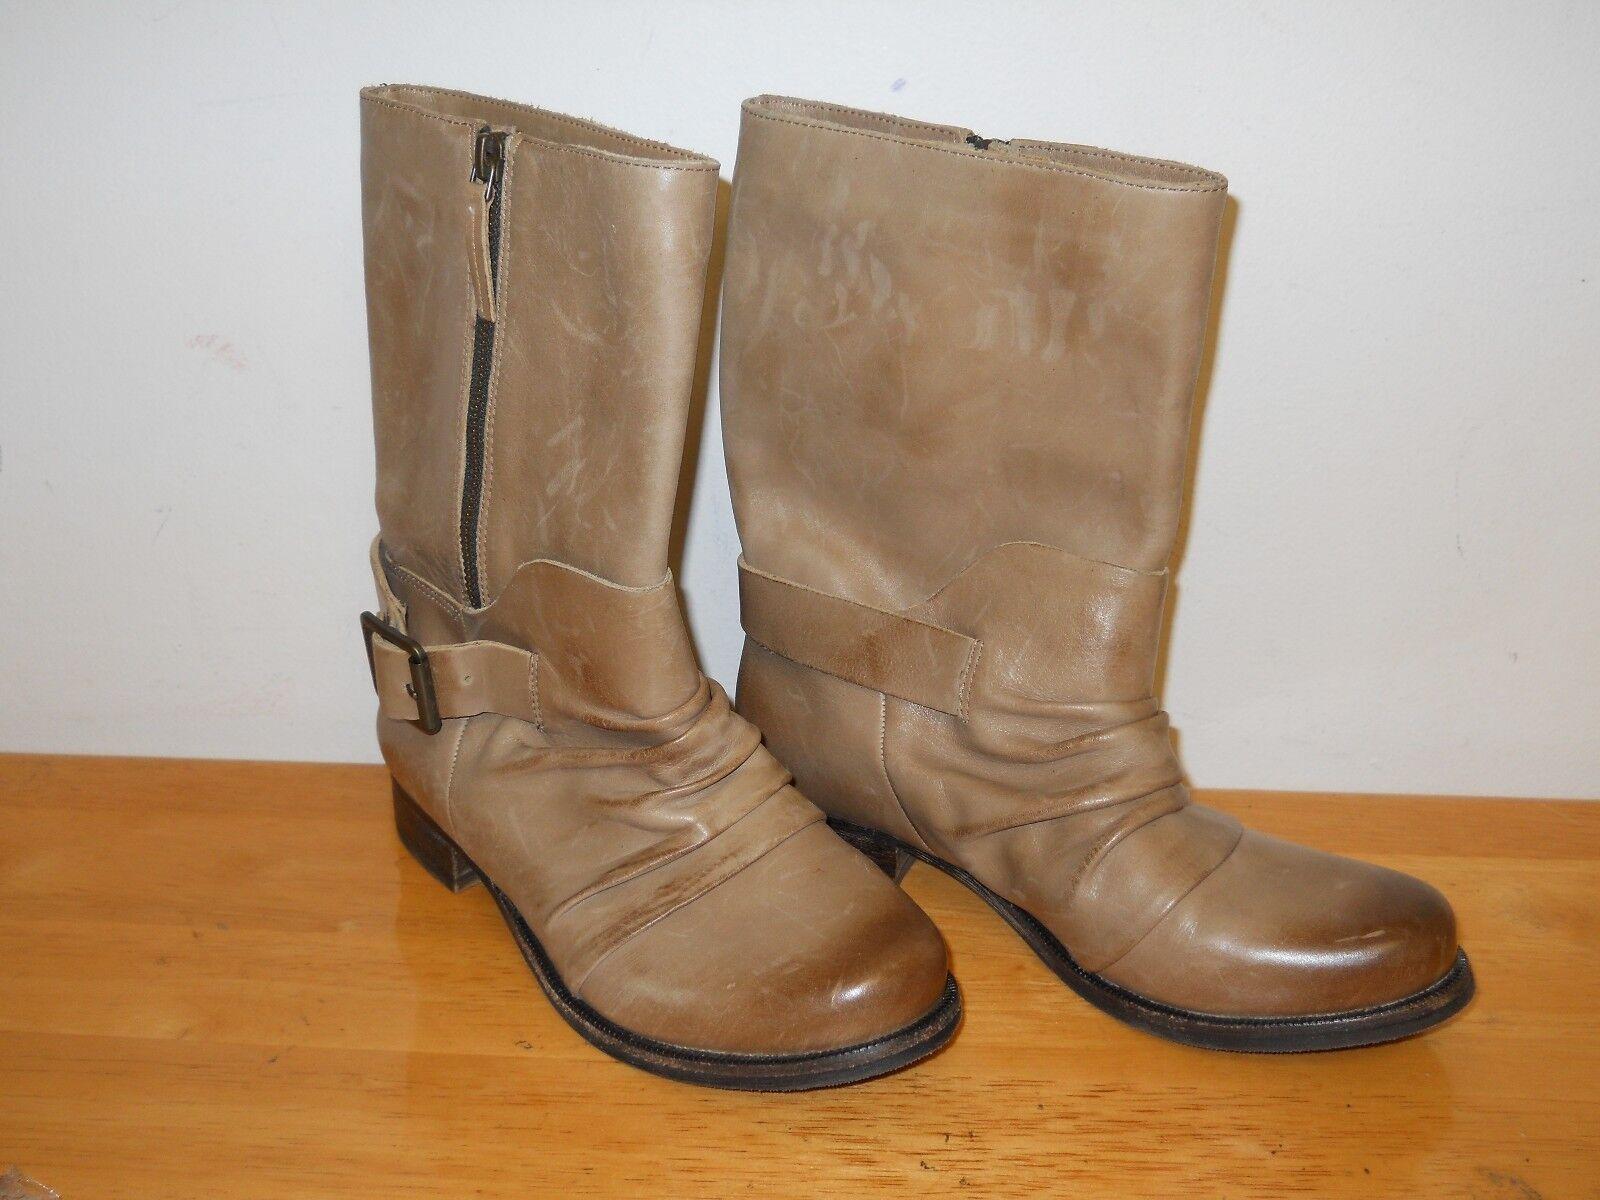 Vince Camuto NEU Damenschuhe Shada Light Braun Stiefel 6 M Schuhes NWOB